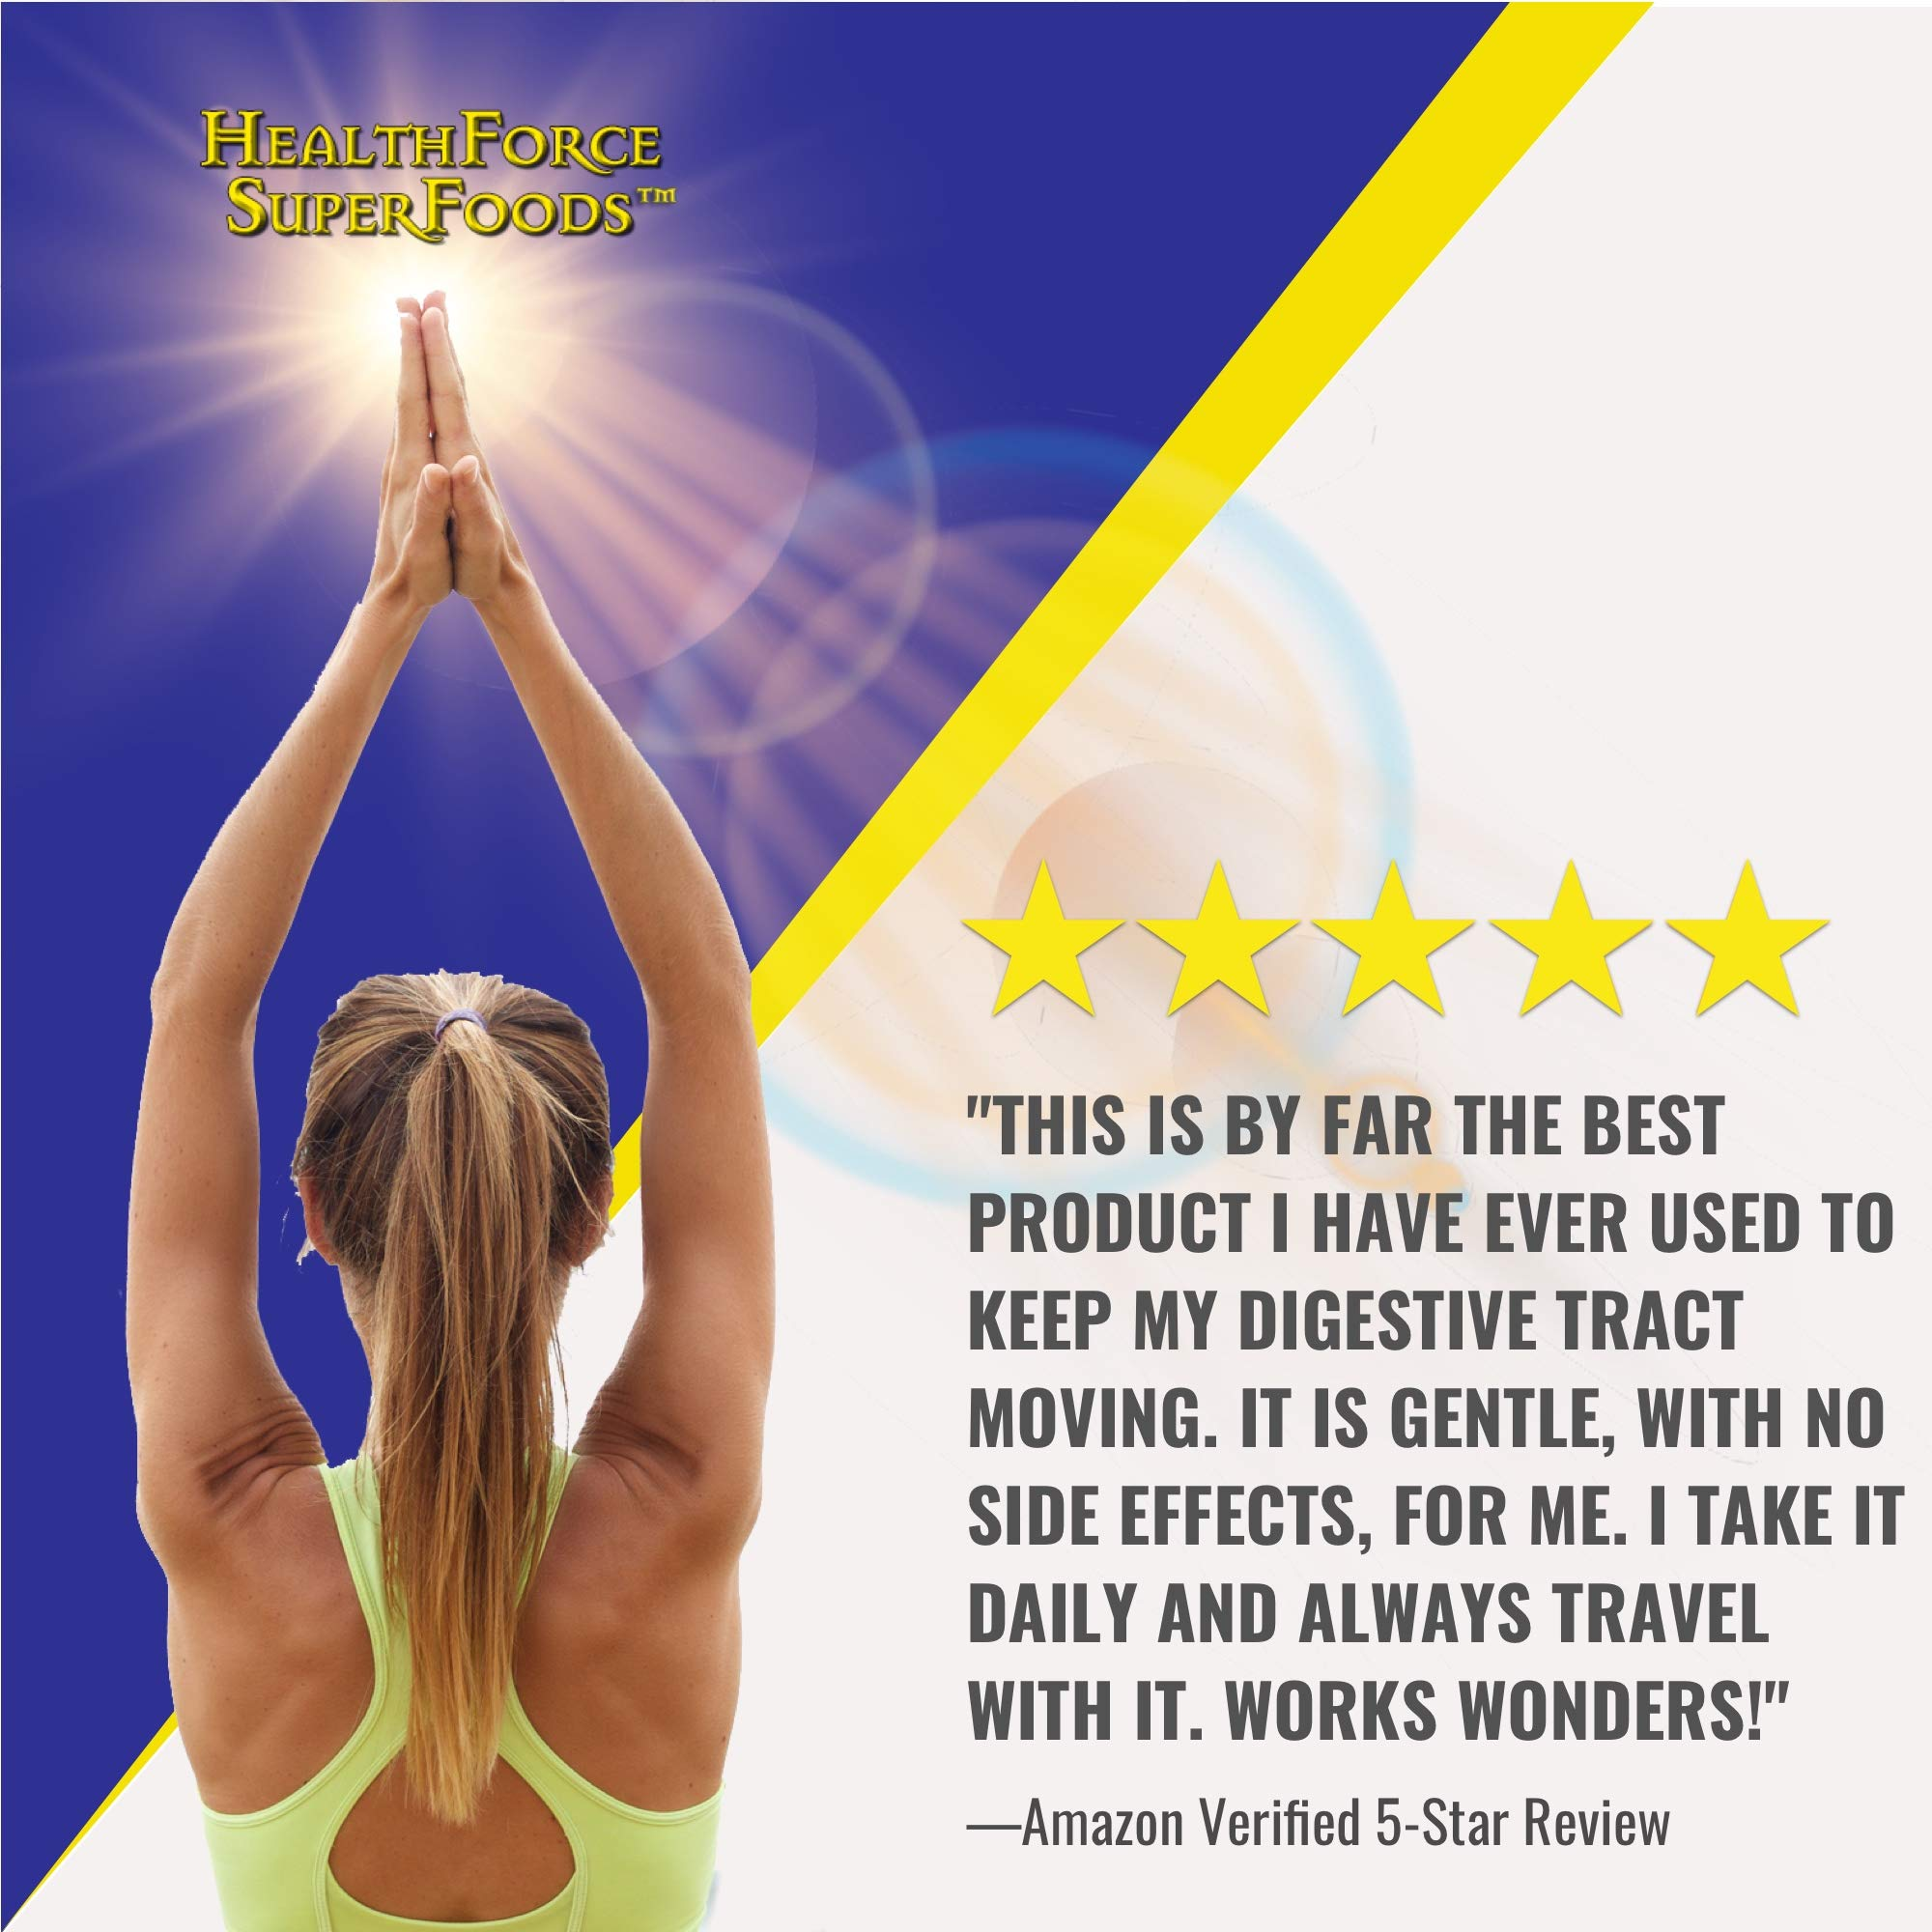 HealthForce SuperFoods Intestinal Movement Formula, Herbal Laxative, All-Natural, Organic, Non-GMO, Gluten-Free, Kosher, Vegan, 120 Count by HEALTHFORCE SUPERFOODS (Image #2)